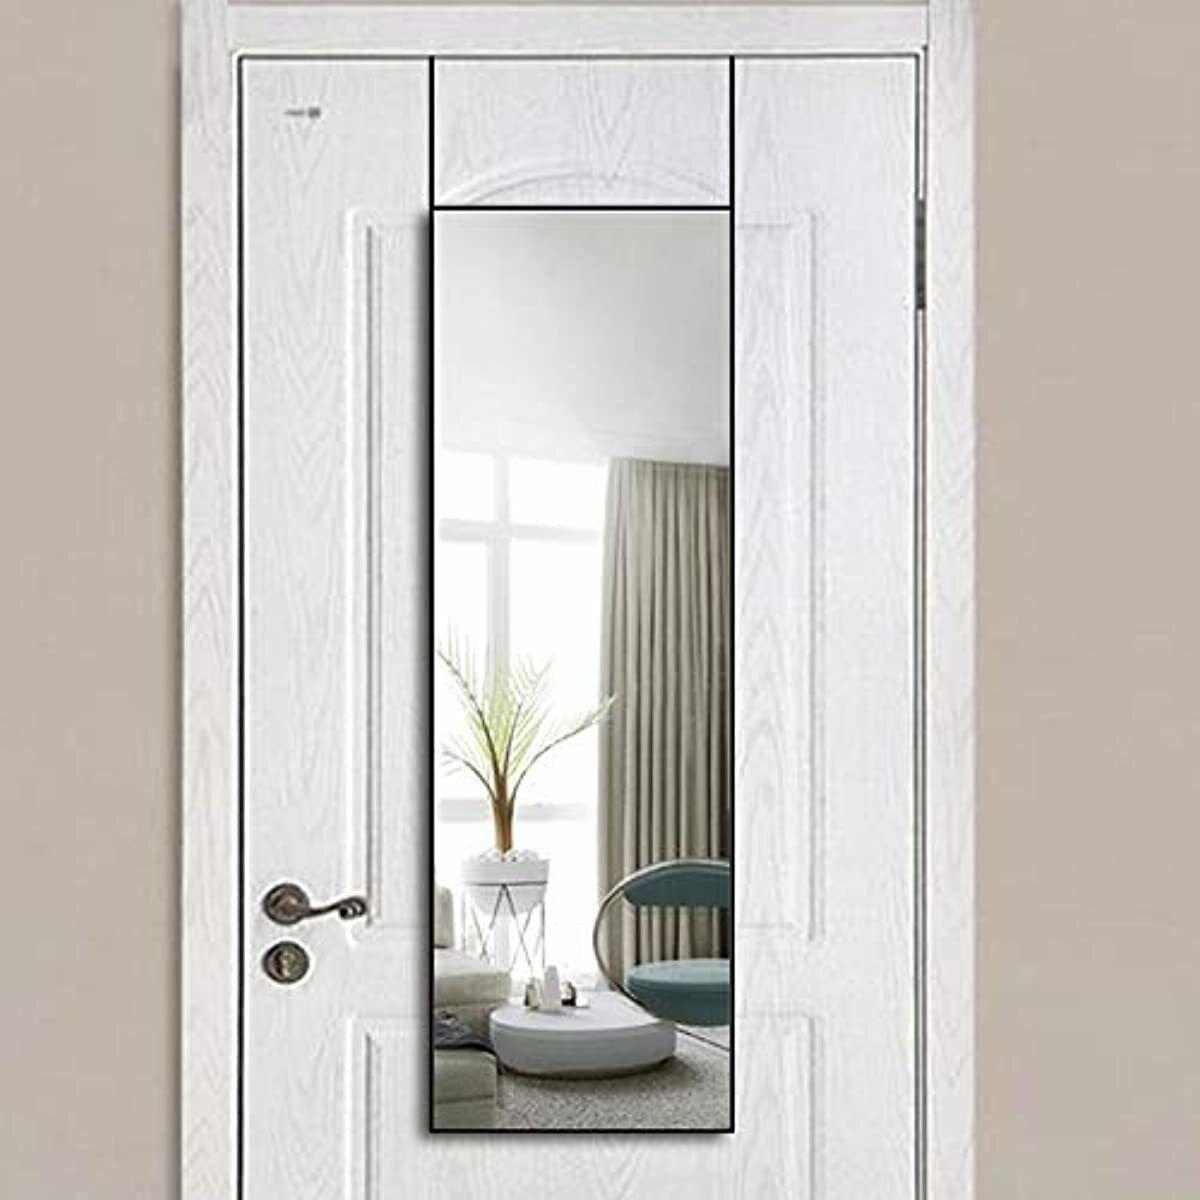 Full Length Vanity Mirror Standing Mirror Bedroom Floor Mirror Dressing Mirror Ebay